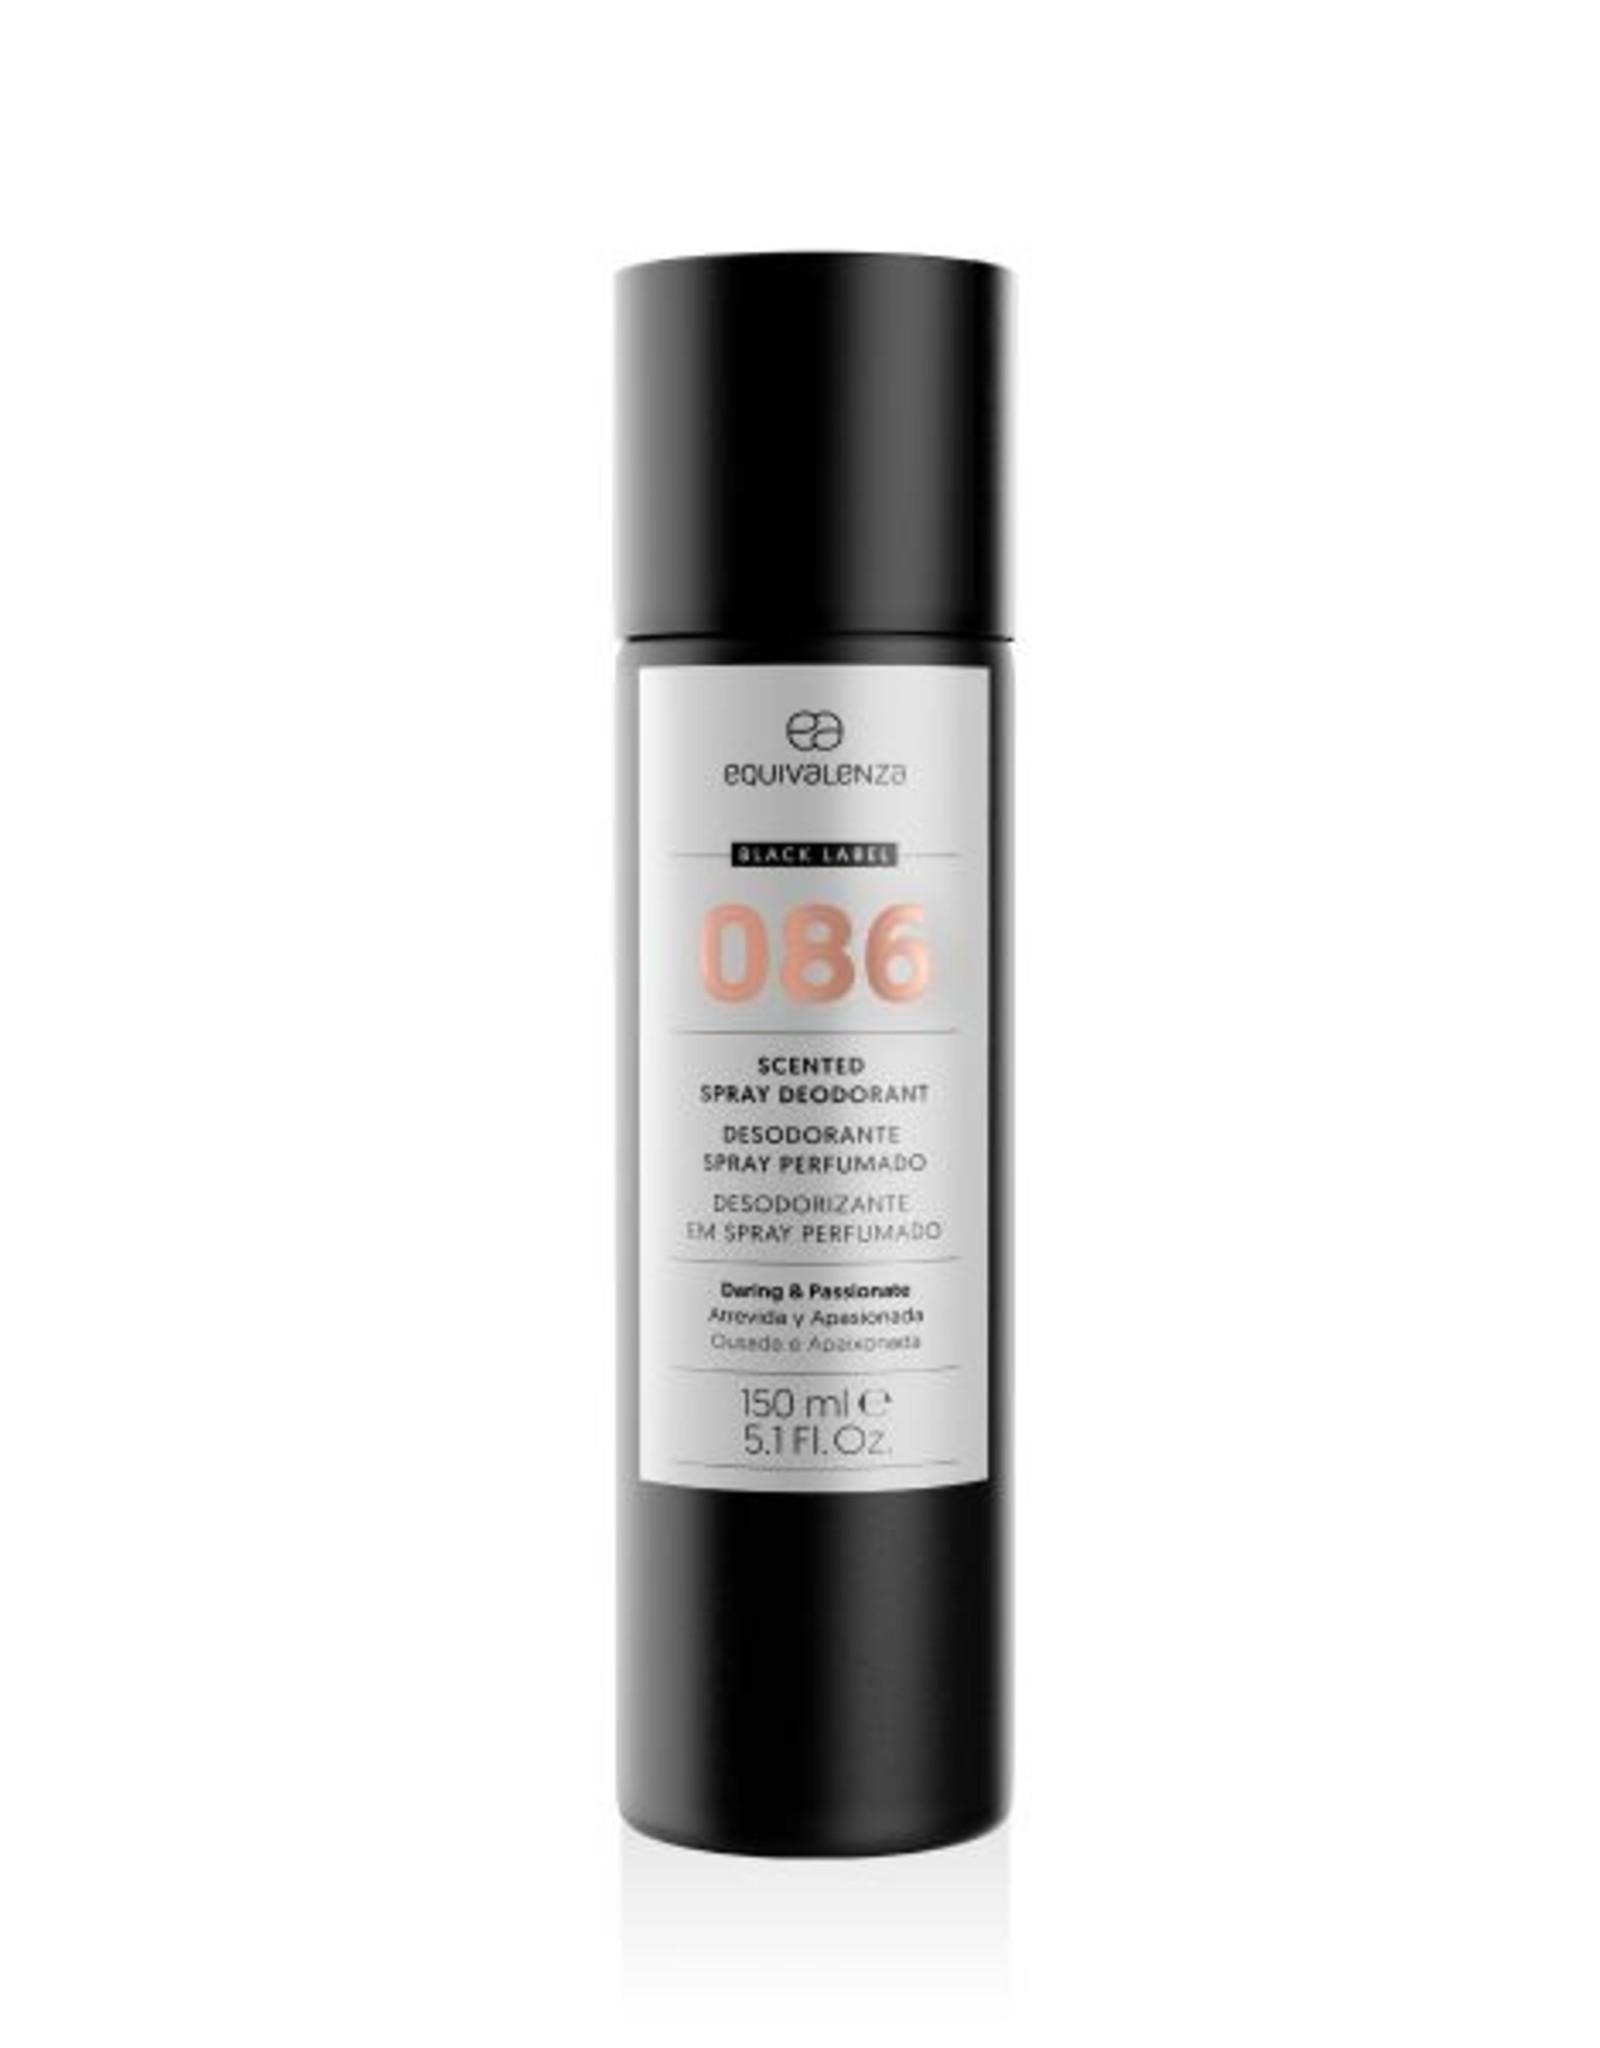 Equivalenza Black Label Deodorant 086